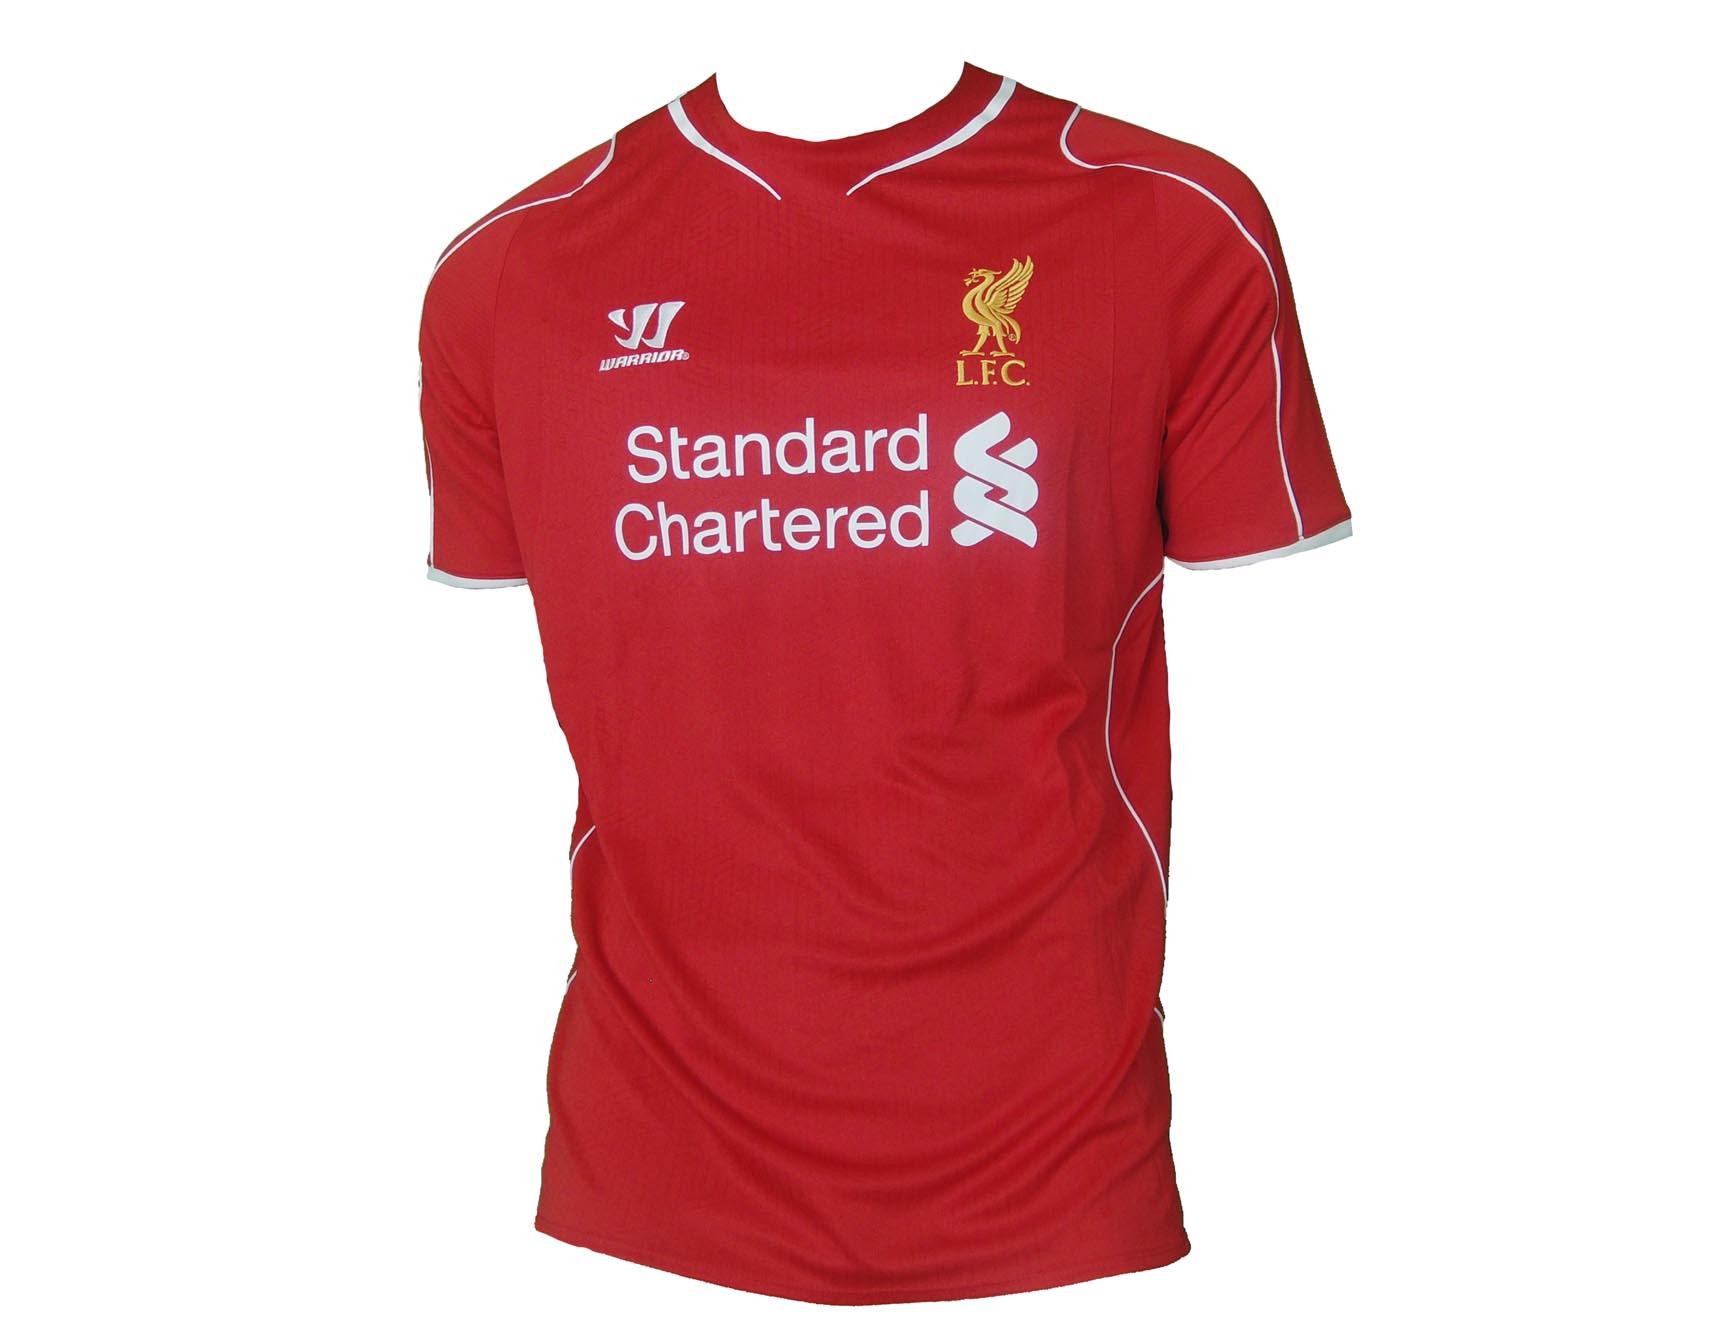 huge discount 96544 42177 House of Shirts | Trikots | Fußball Fanartikel | Bekleidung ...